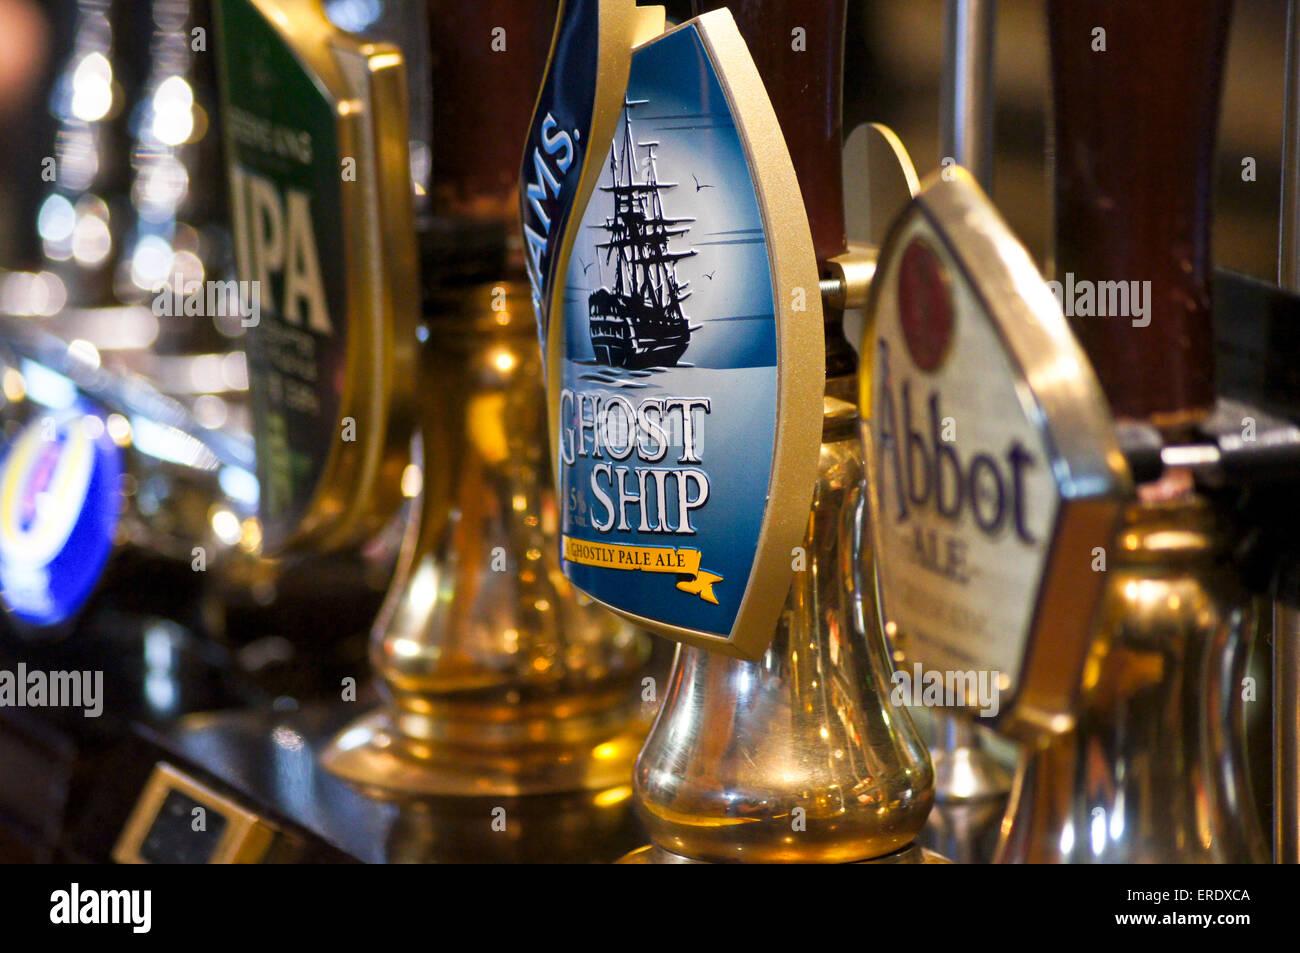 real-ale-handpumps-and-pump-clips-on-a-pub-bar-adnams-ghost-ship-greene-ERDXCA.jpg